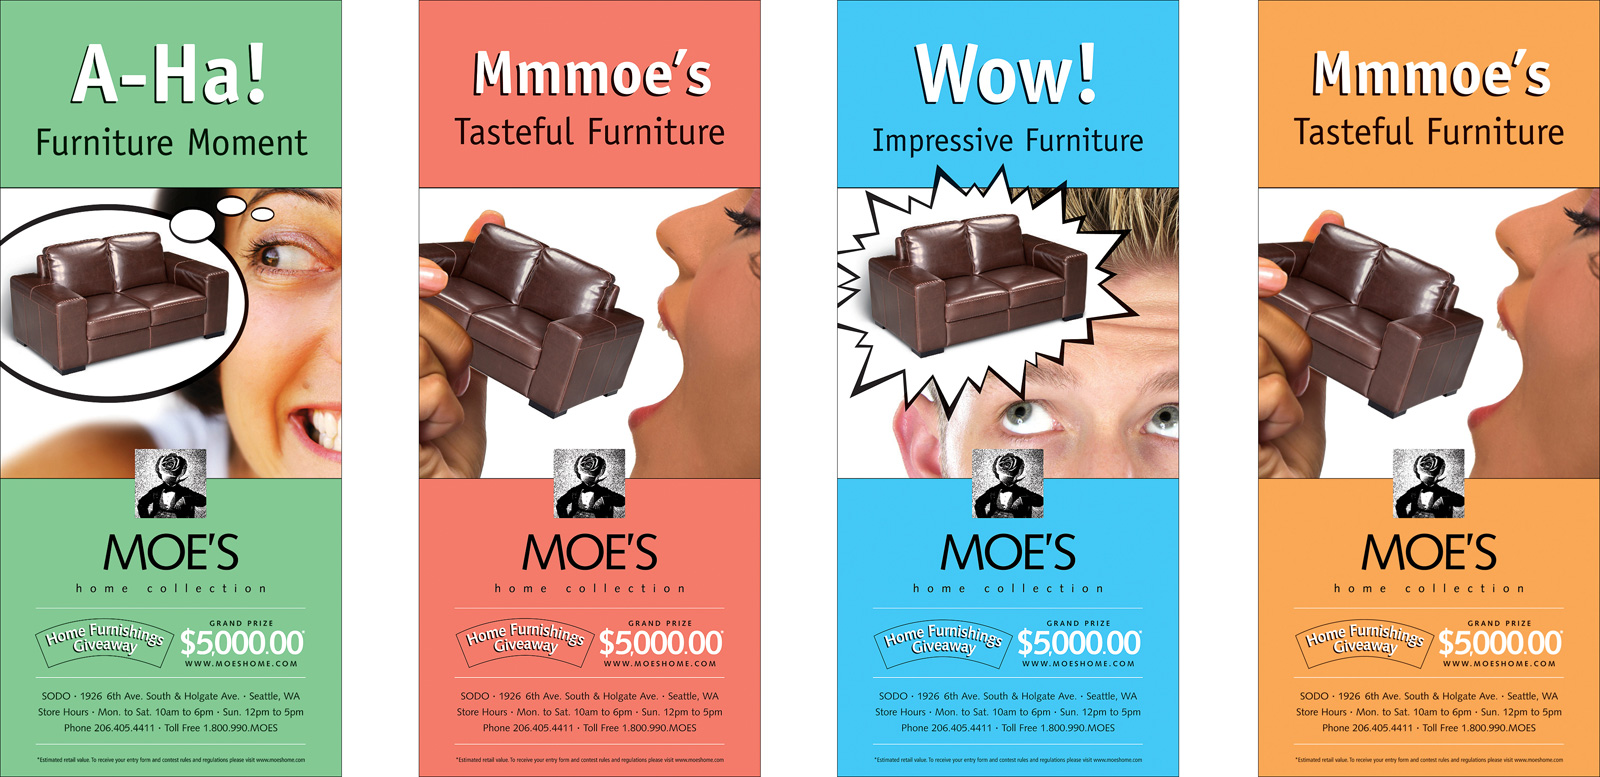 Furniture-retail-ads-branding.jpg